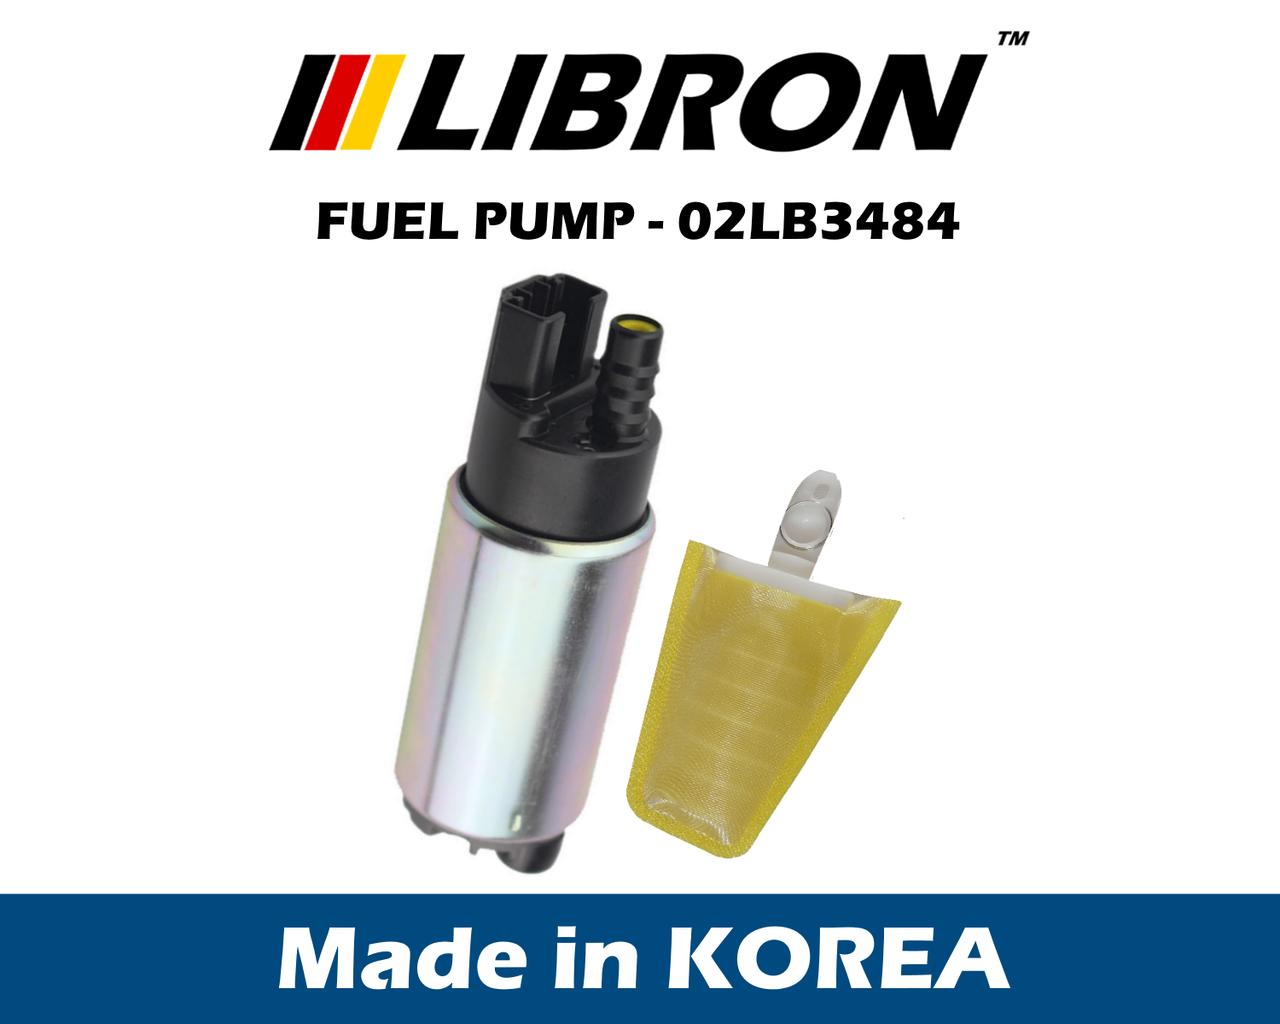 Бензонасос LIBRON 02LB3484 - Мазда 626 IV Hatchback